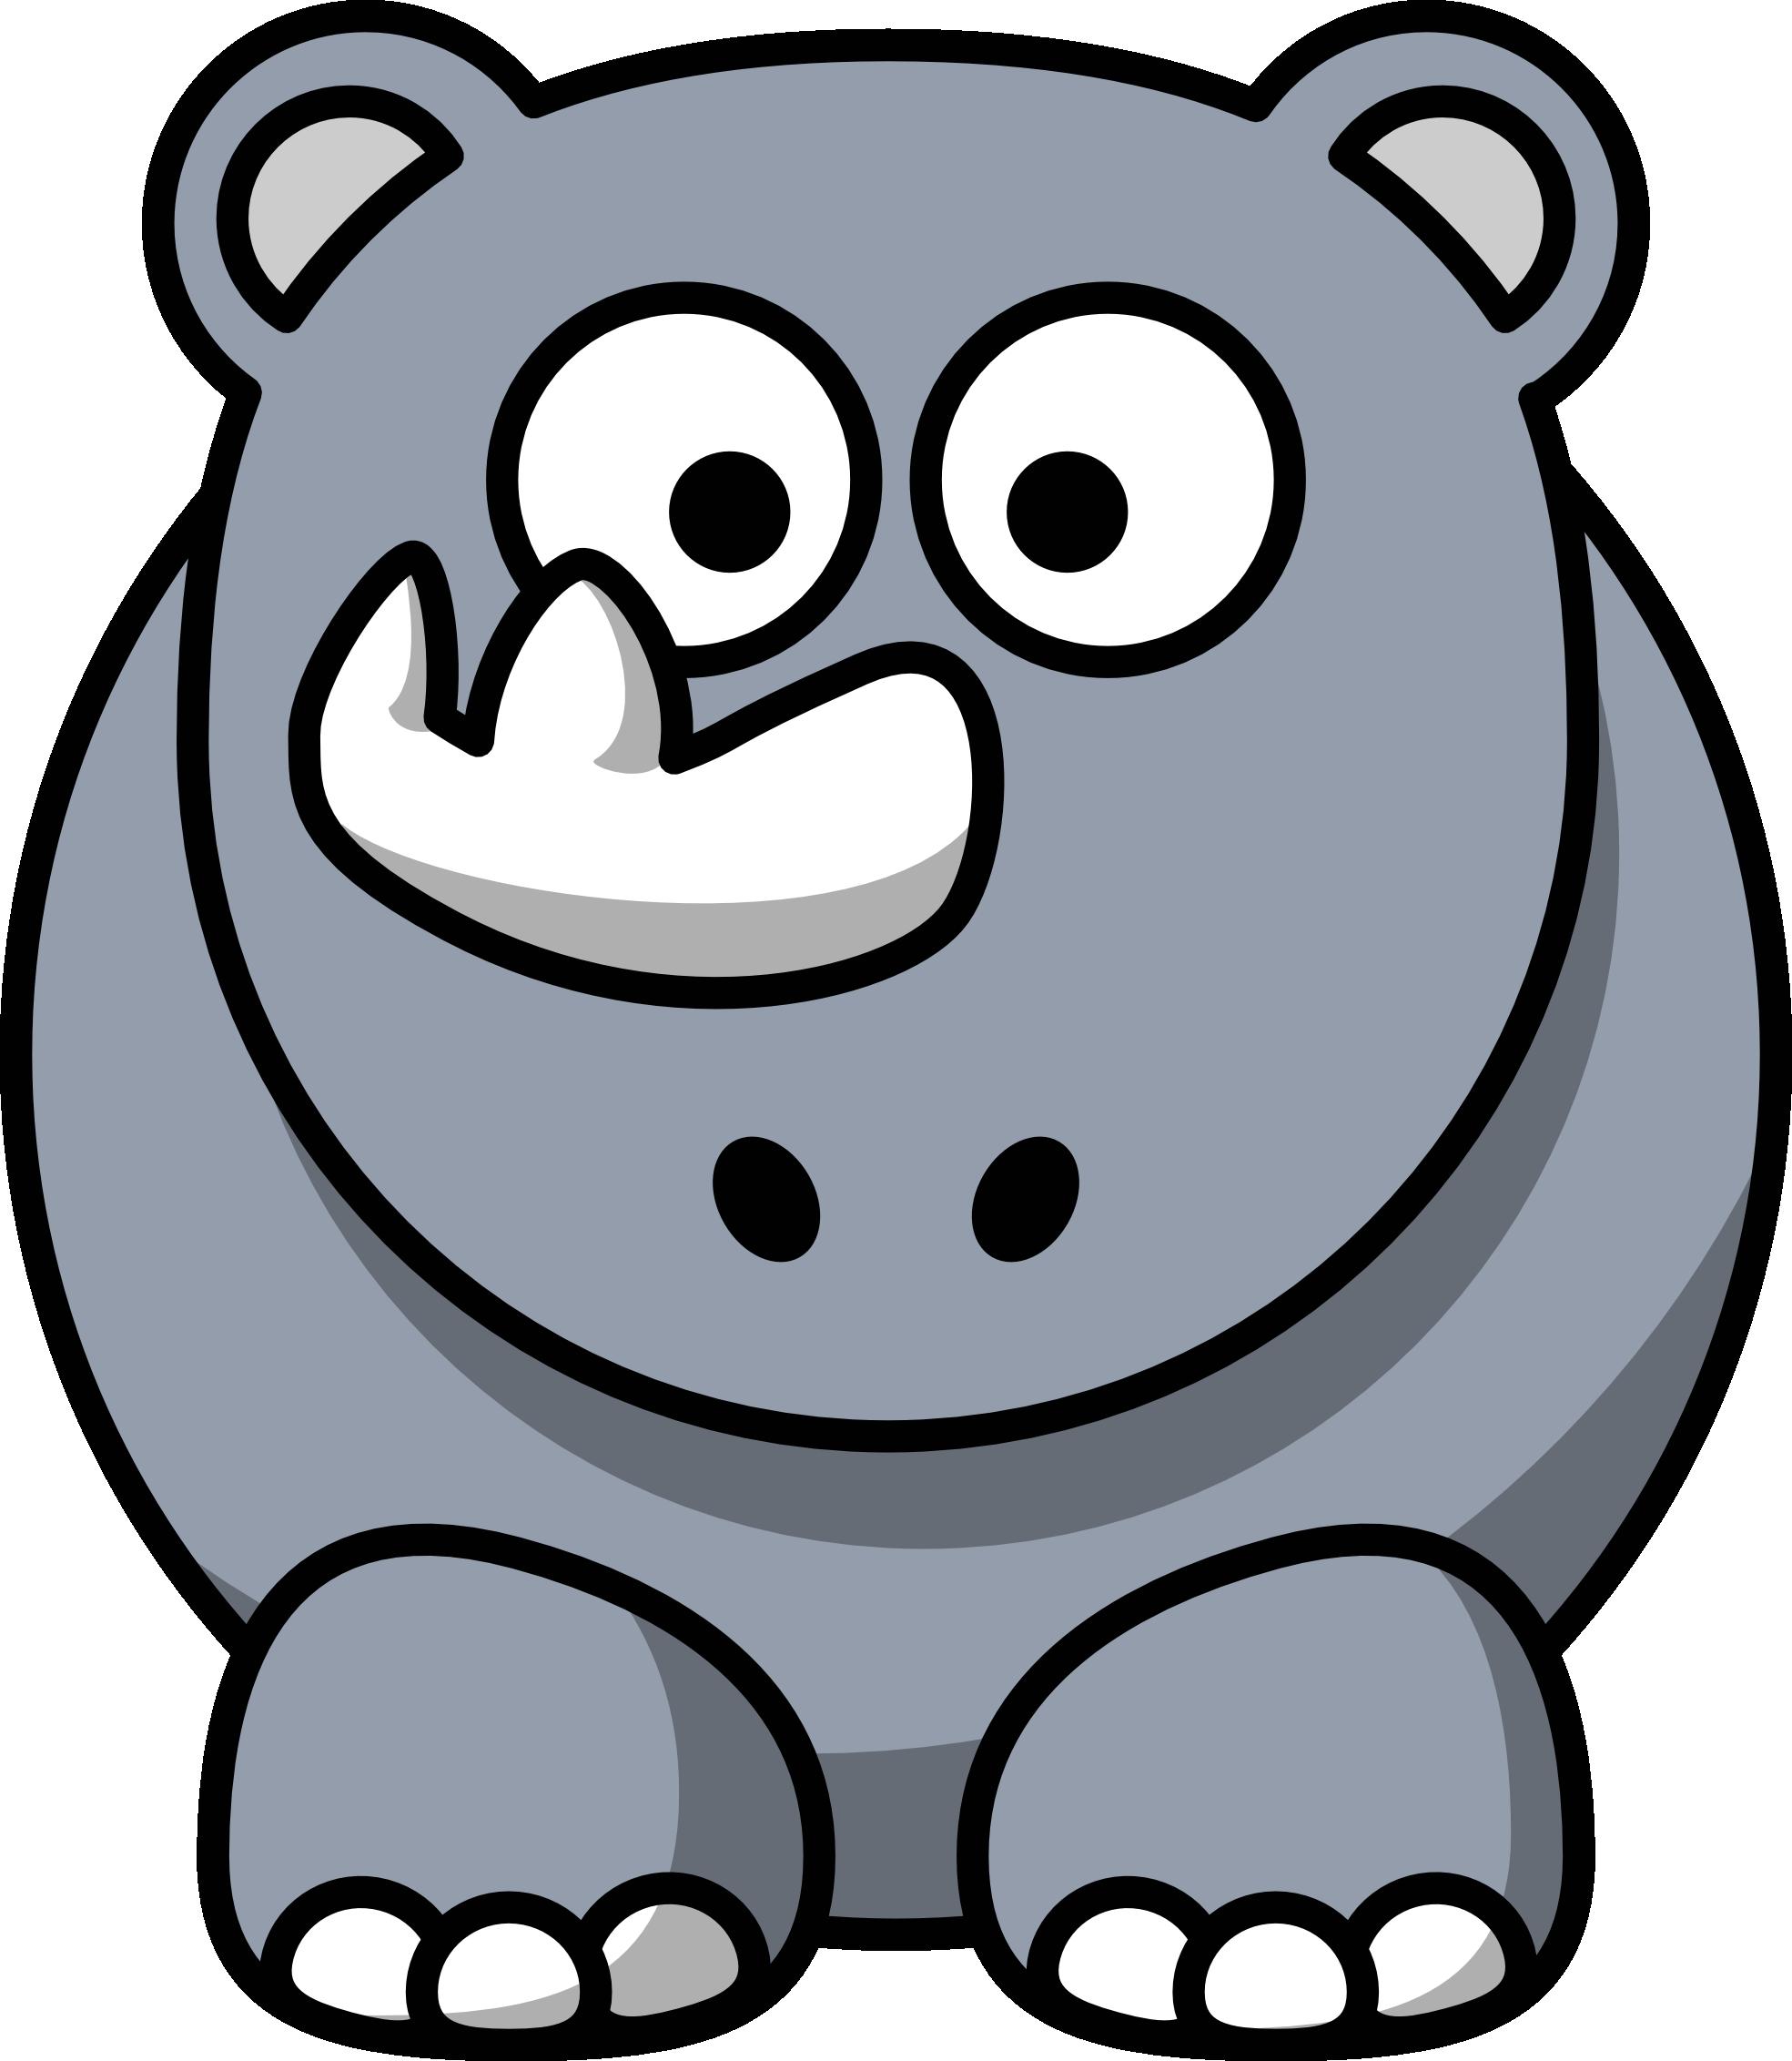 Charging Rhino clipart Rhino Charging #5 Download Download